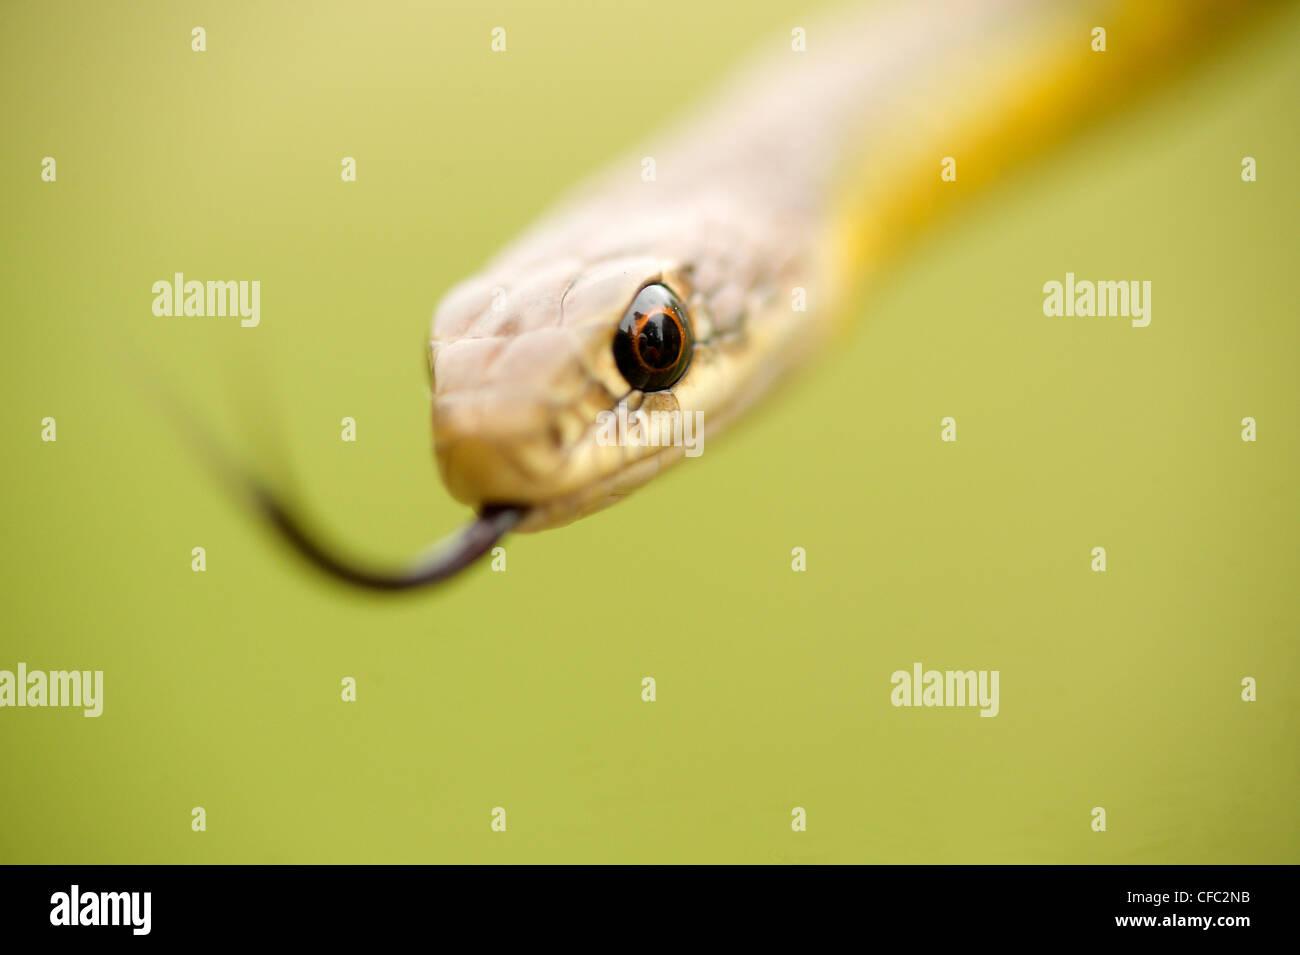 Amarillo-curva Racer (Coluber constrictor), Lago Blanco, Okanagan, Columbia Británica, Canadá Imagen De Stock